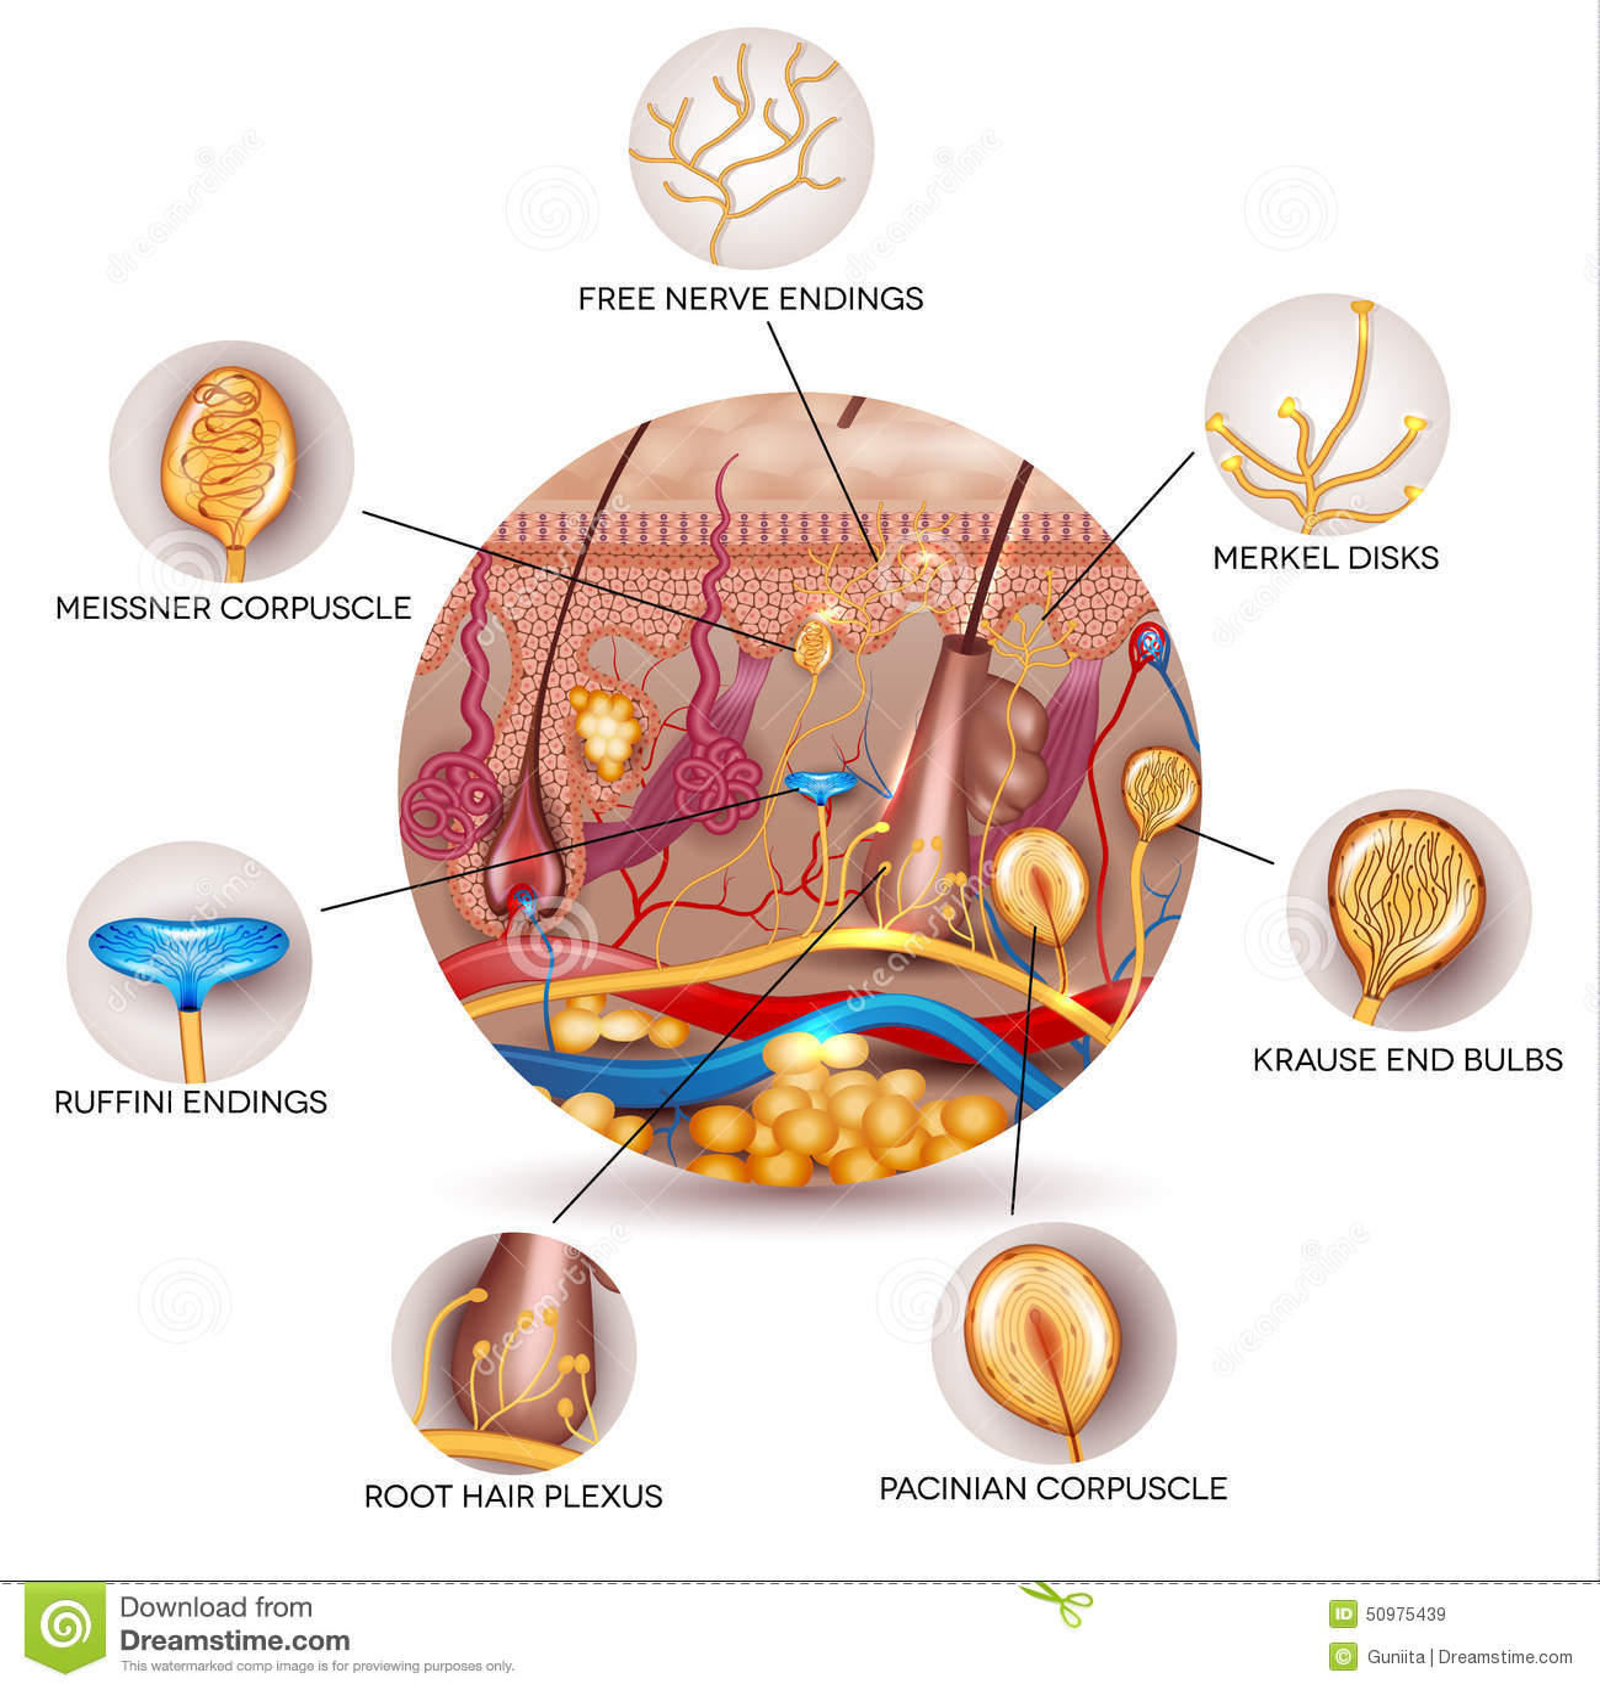 Skin Anatomy And Sensory Receptors In The Skin Cartoon